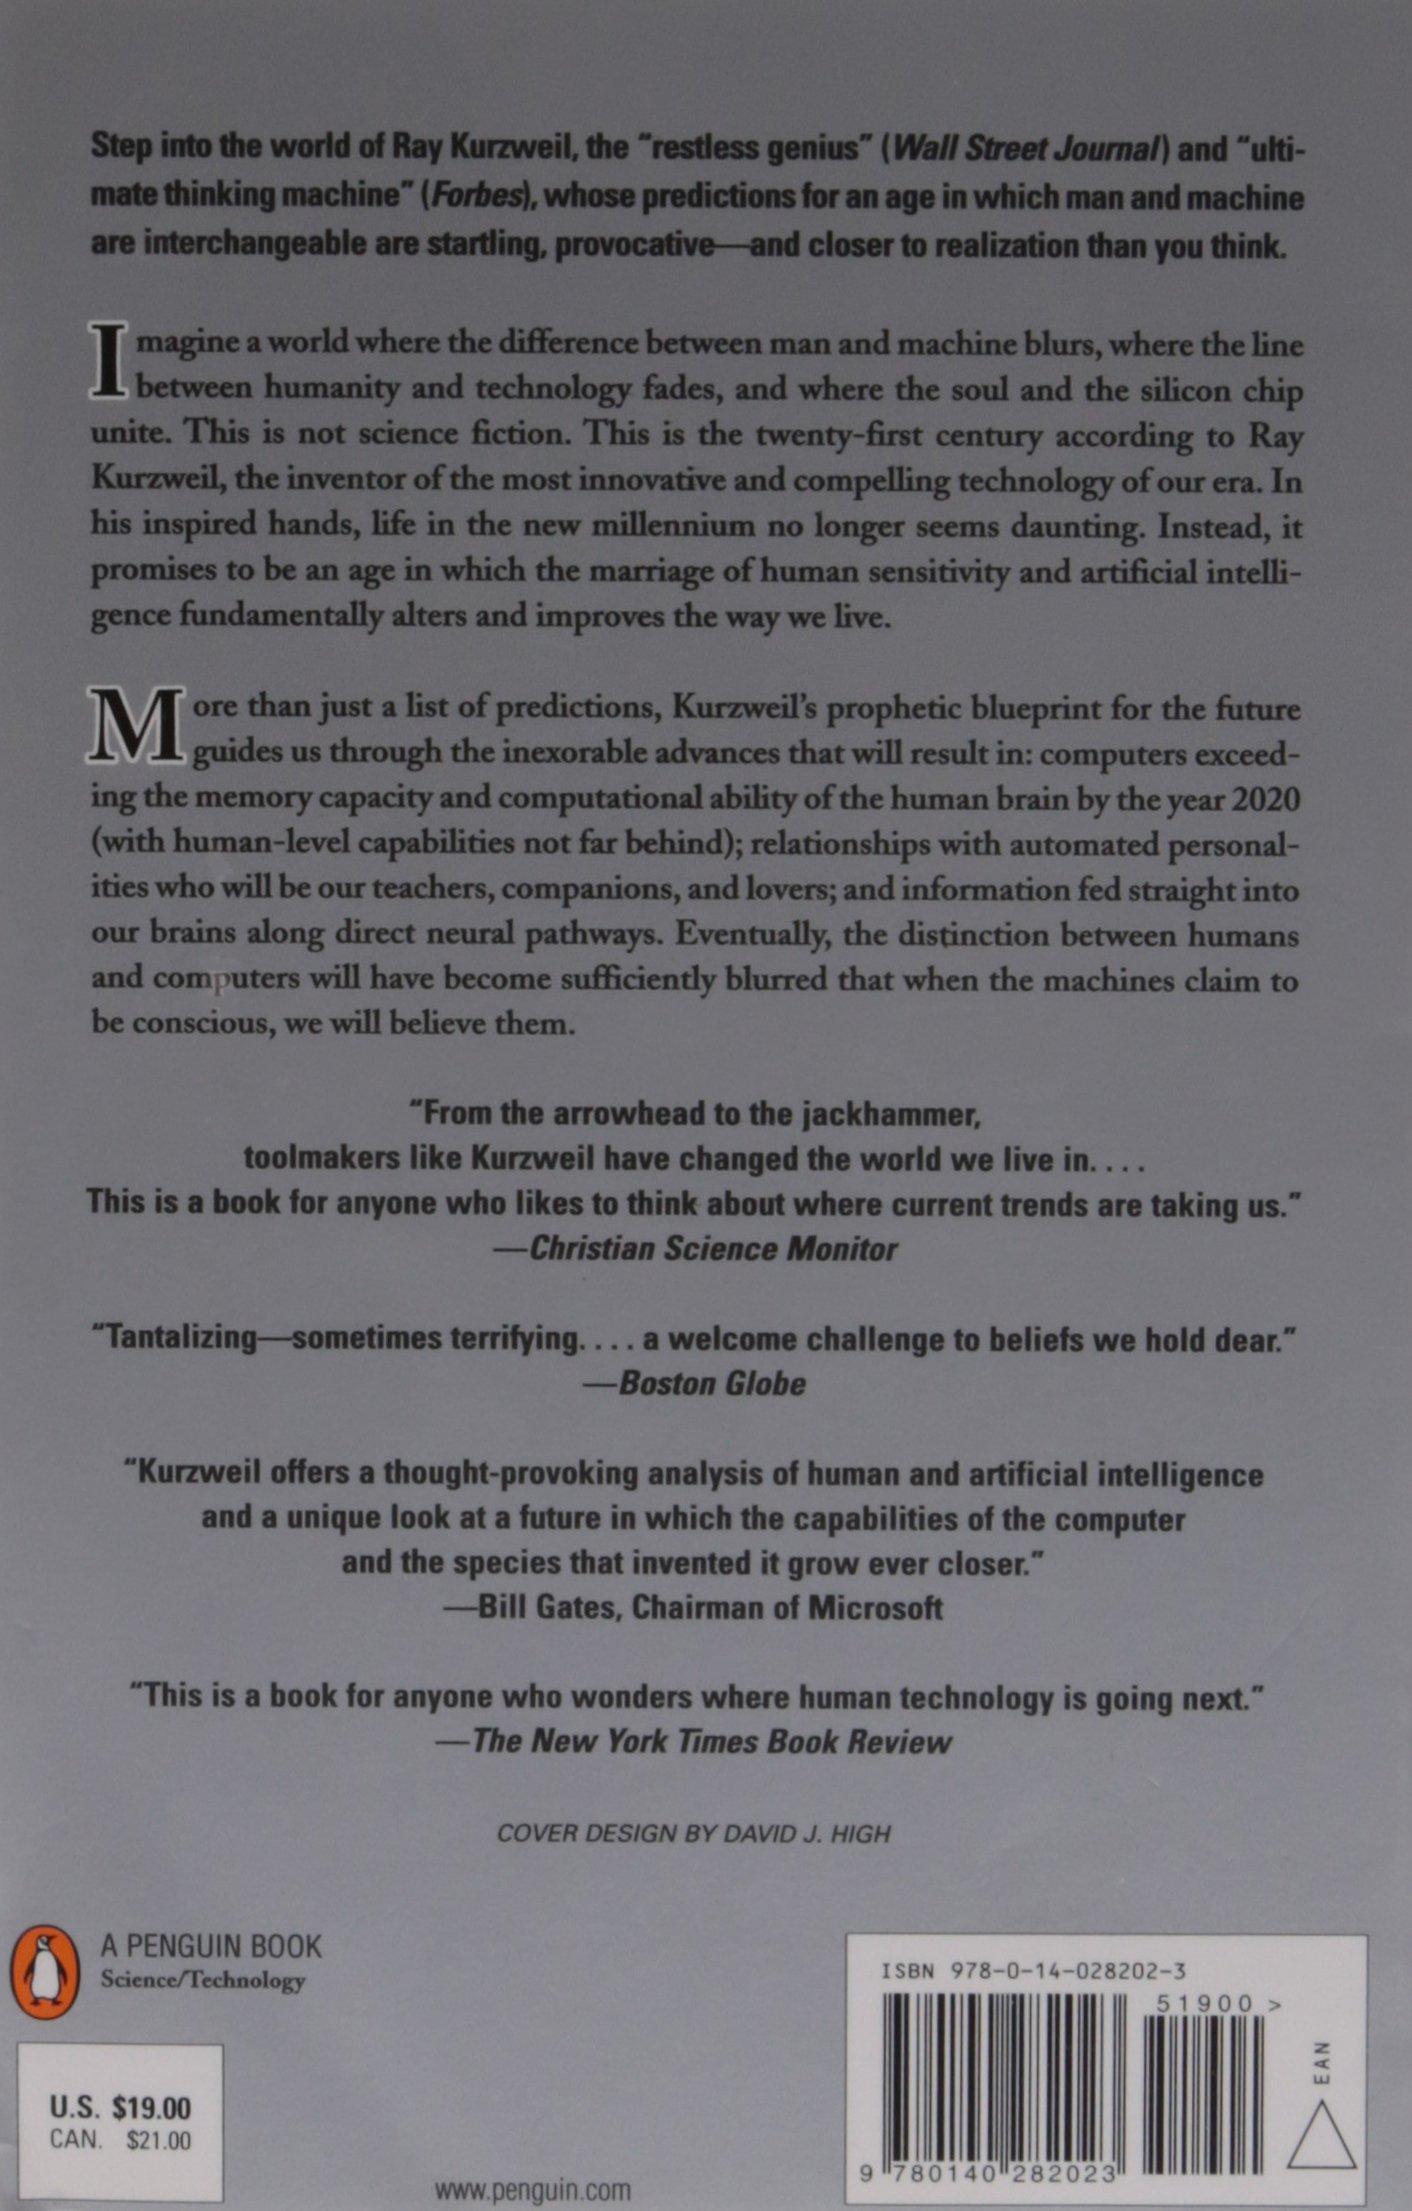 essay about the ways we lie essay academic writing service  essay about the ways we lie